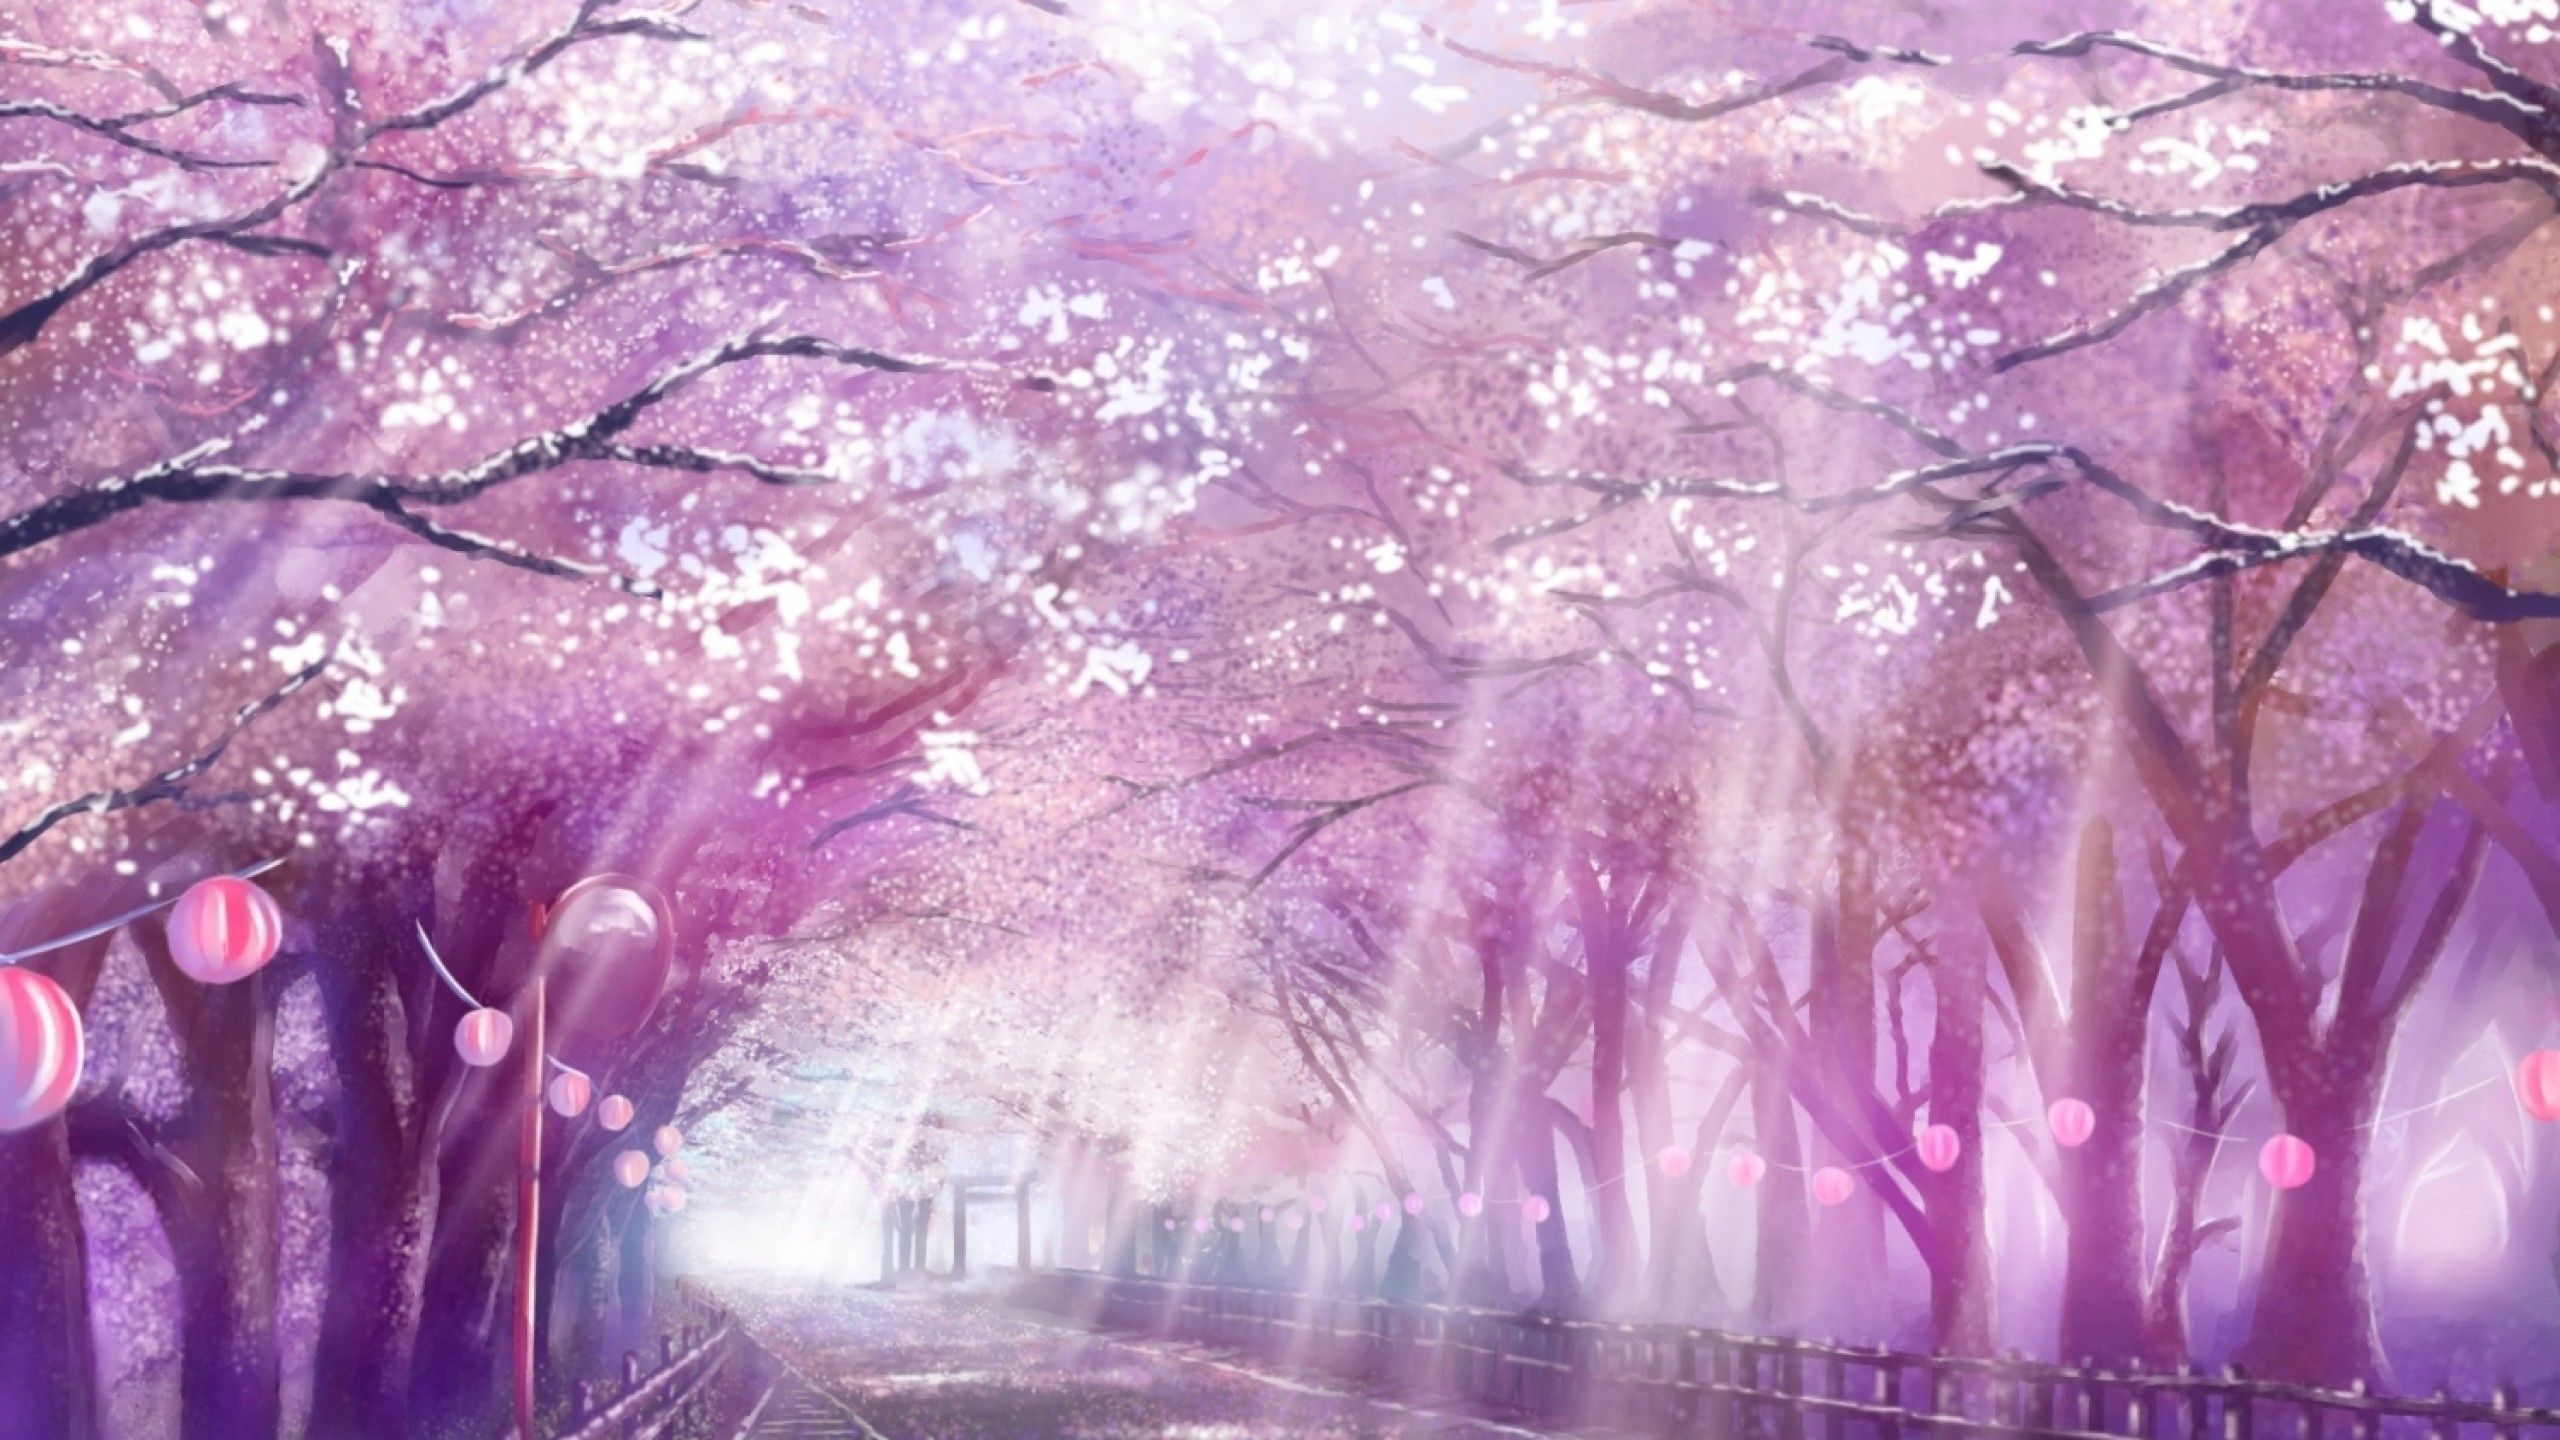 2560x1440 Anime Landscape Scenic Sakura Blossom Cherry Path Sunlight Anime Scenery Anime Scenery Wallpaper Scenery Wallpaper